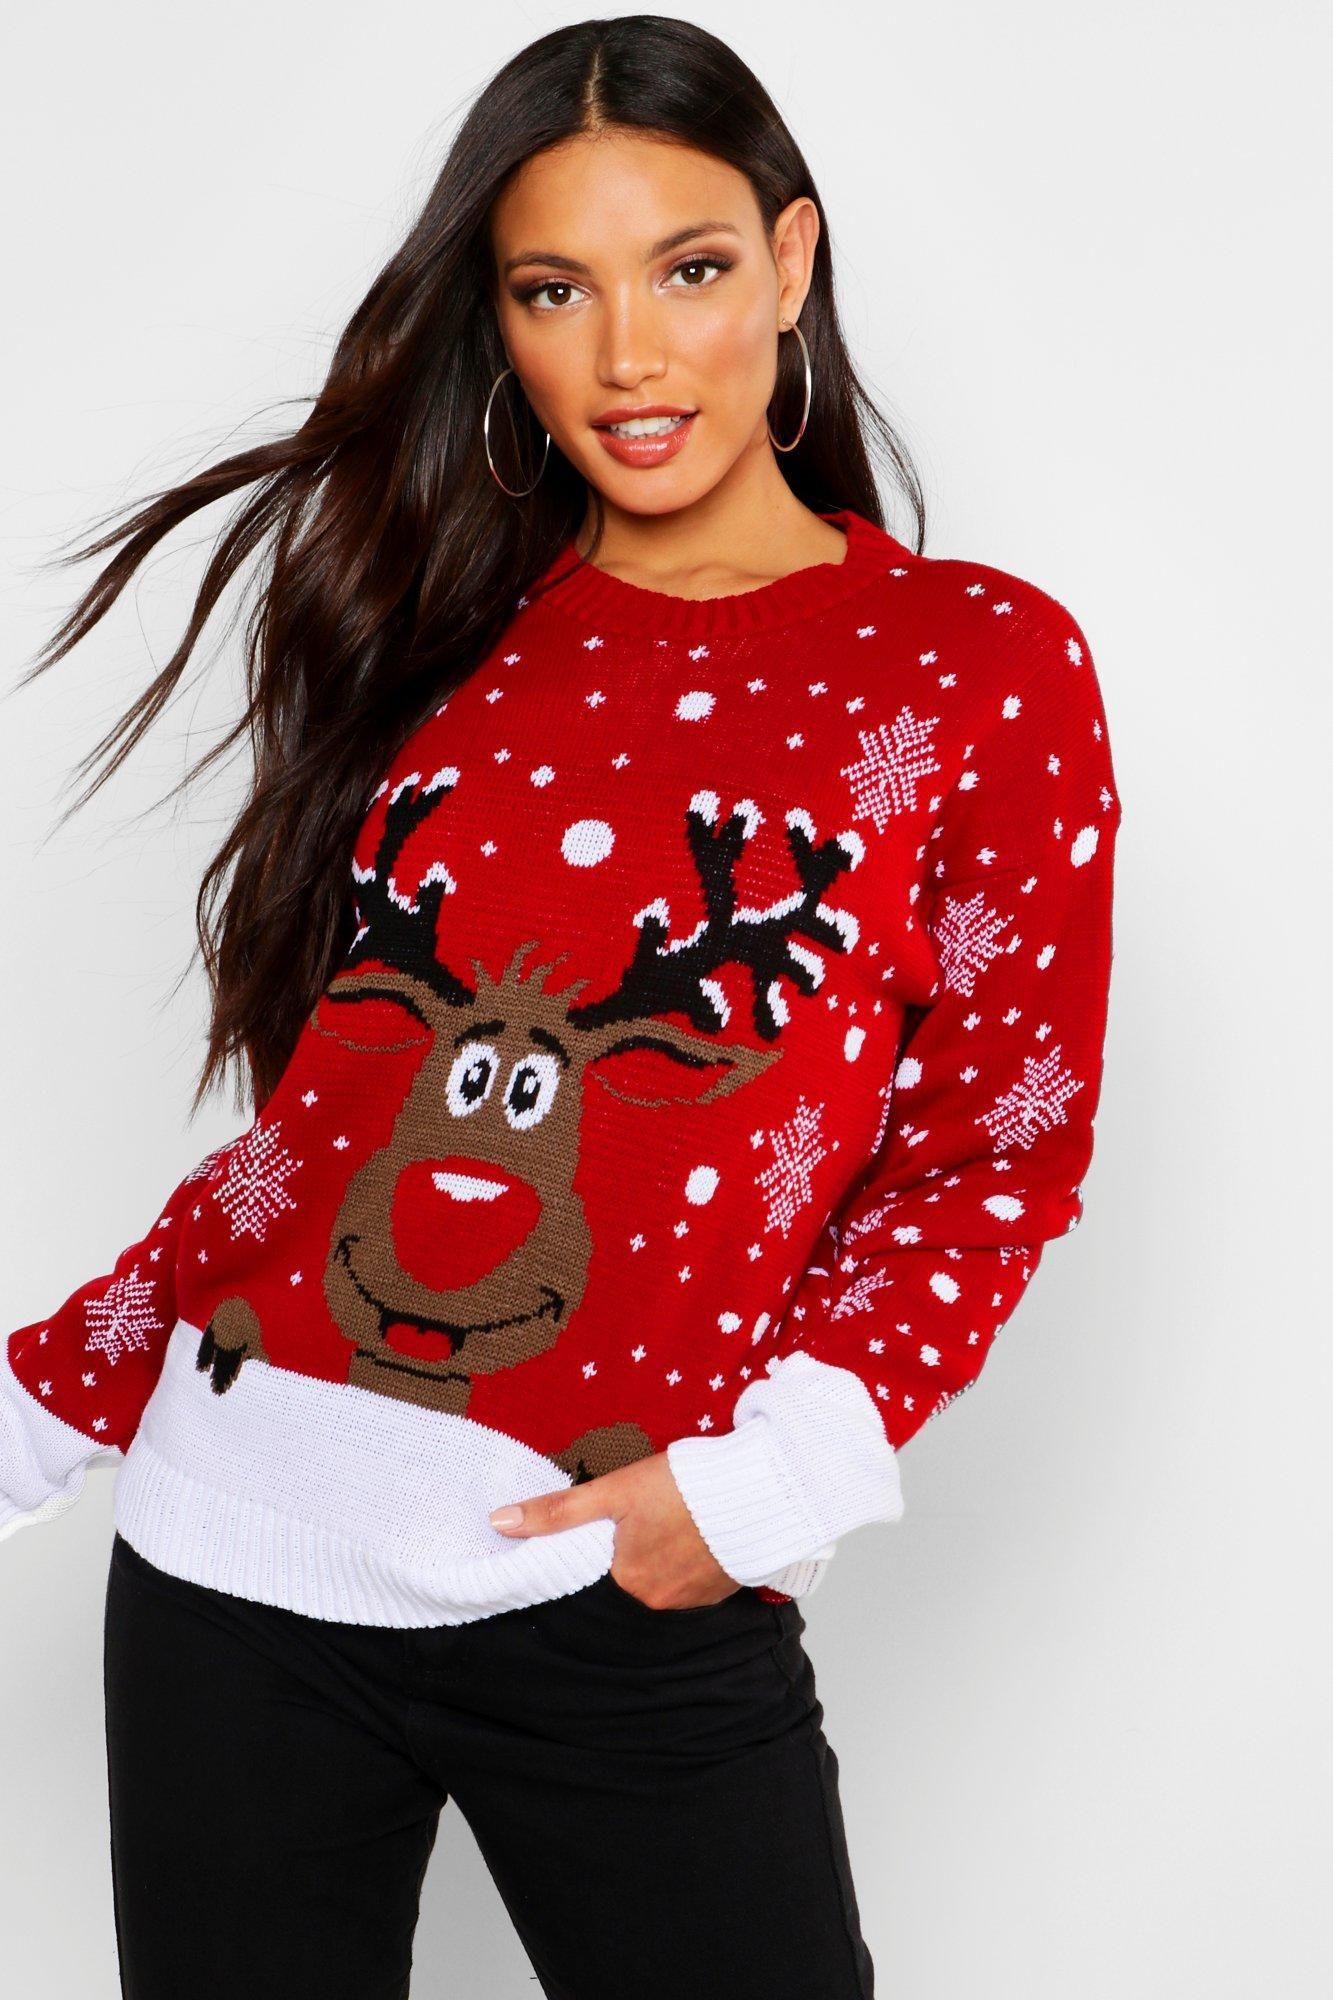 Reindeer Christmas Sweater | Boohoo #reindeerchristmas